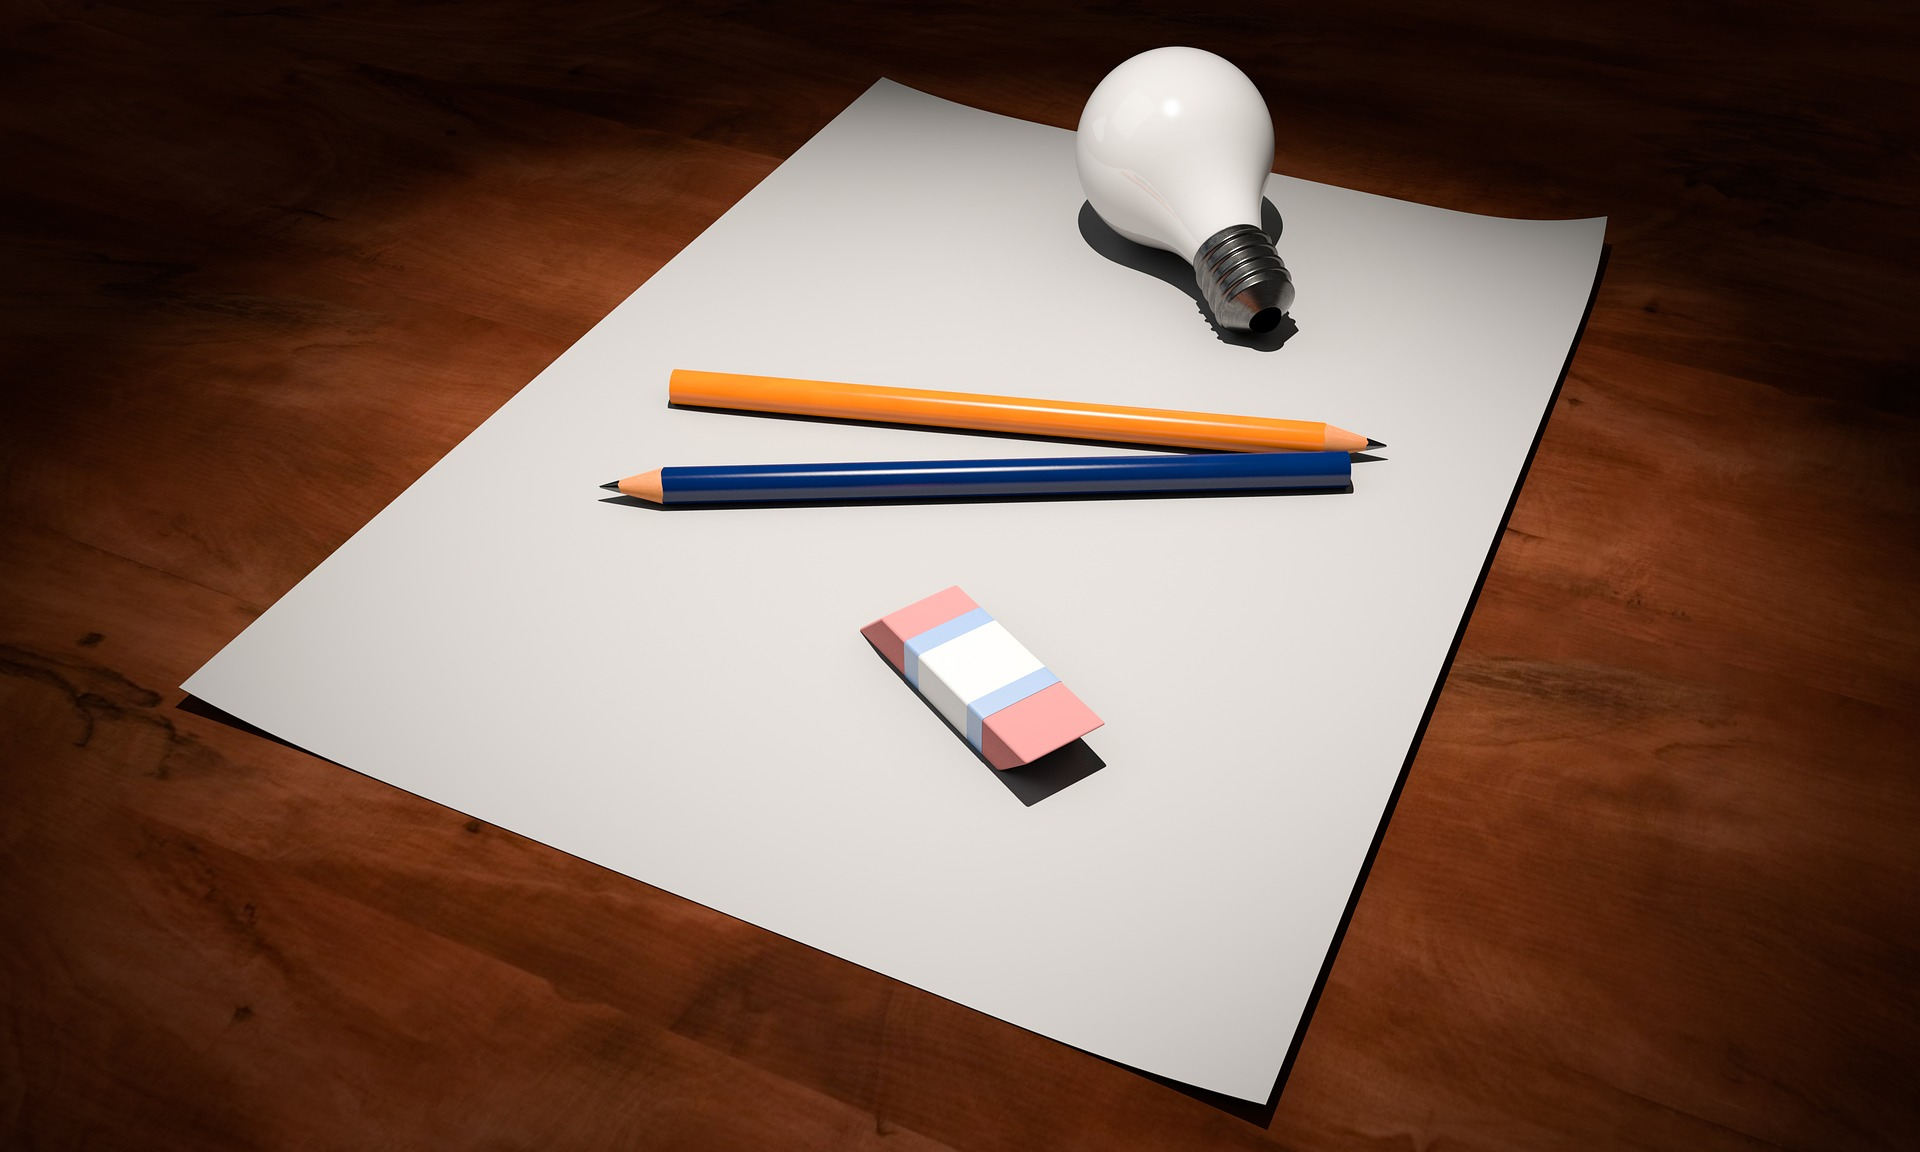 Sumber :https://pixabay.com/id/illustrations/ide-kosong-kertas-pena-lampu-1876659/